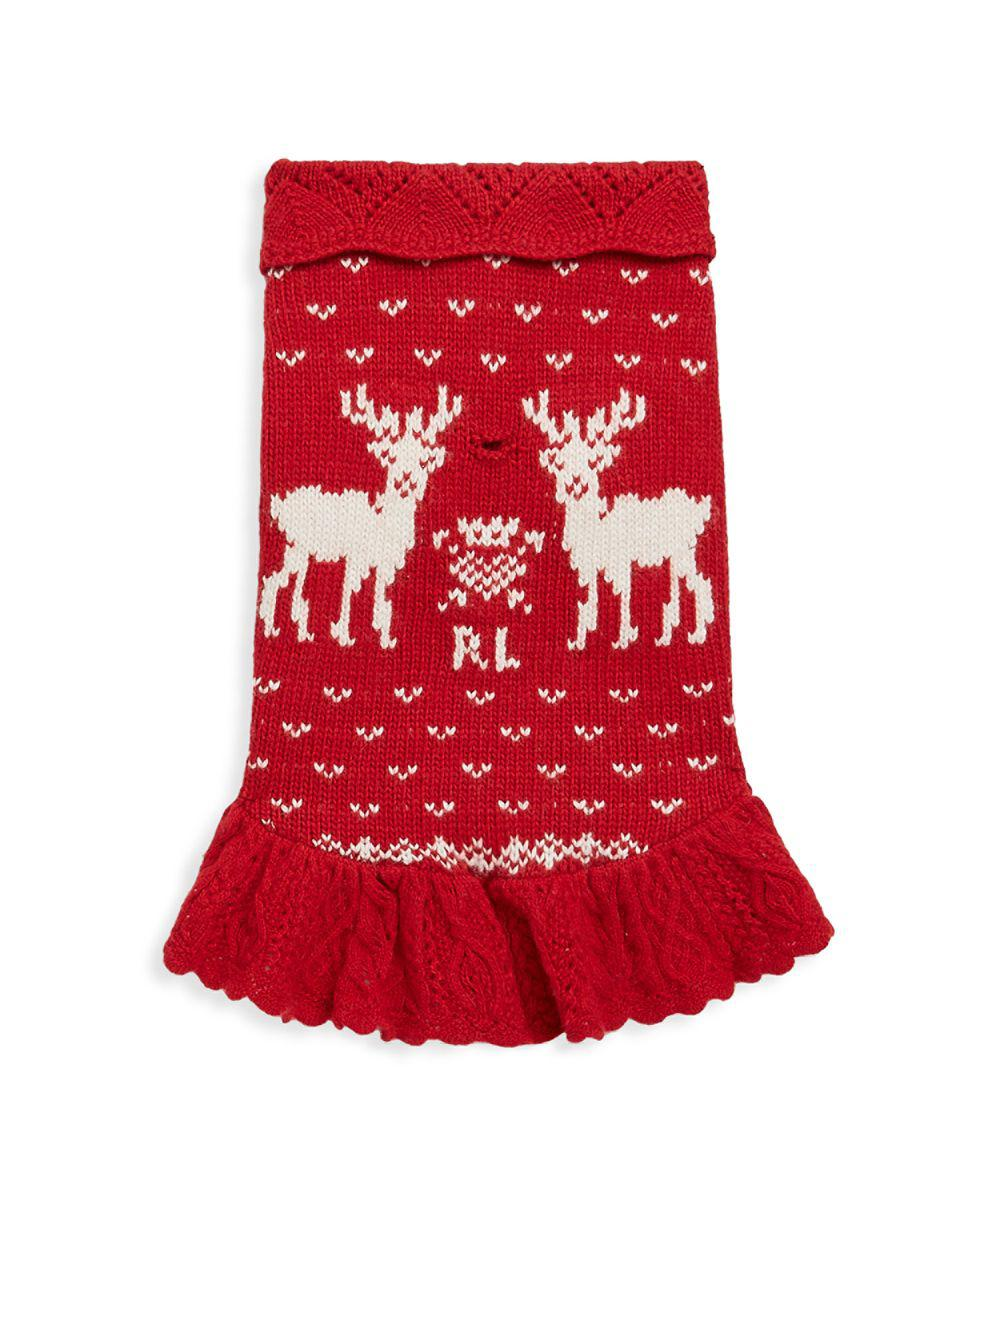 Lyst Polo Ralph Lauren Reindeer Dog Sweater In Red